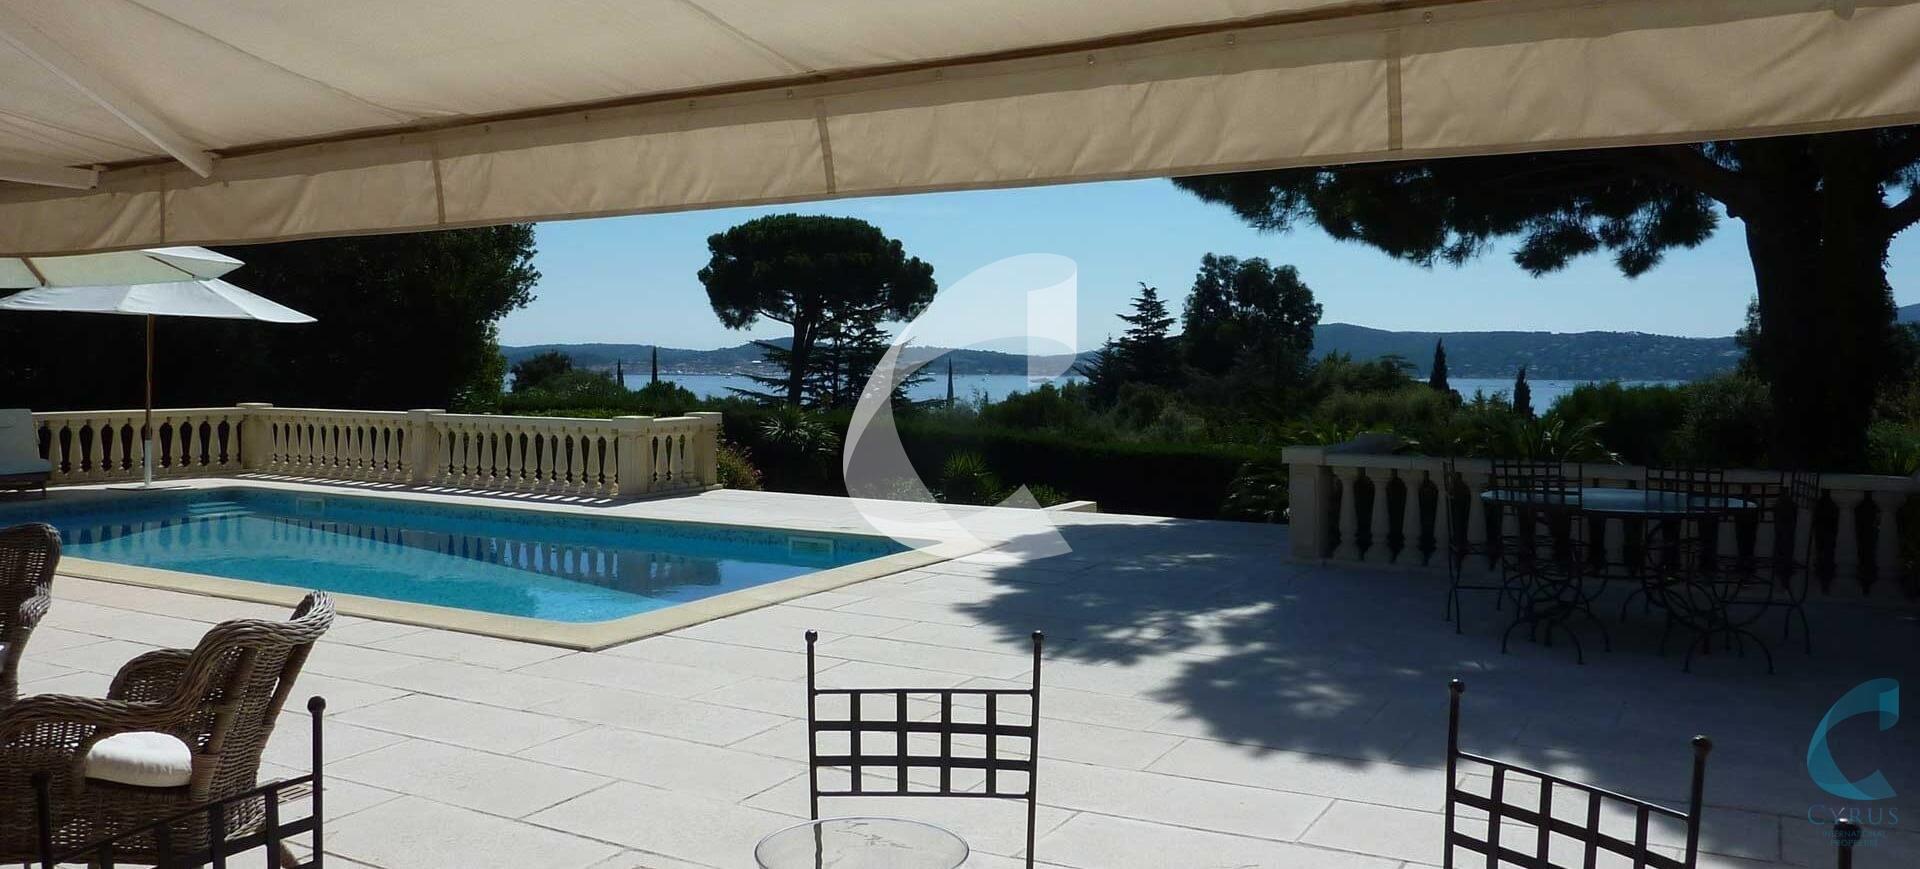 Holiday Villa Saint-tropez